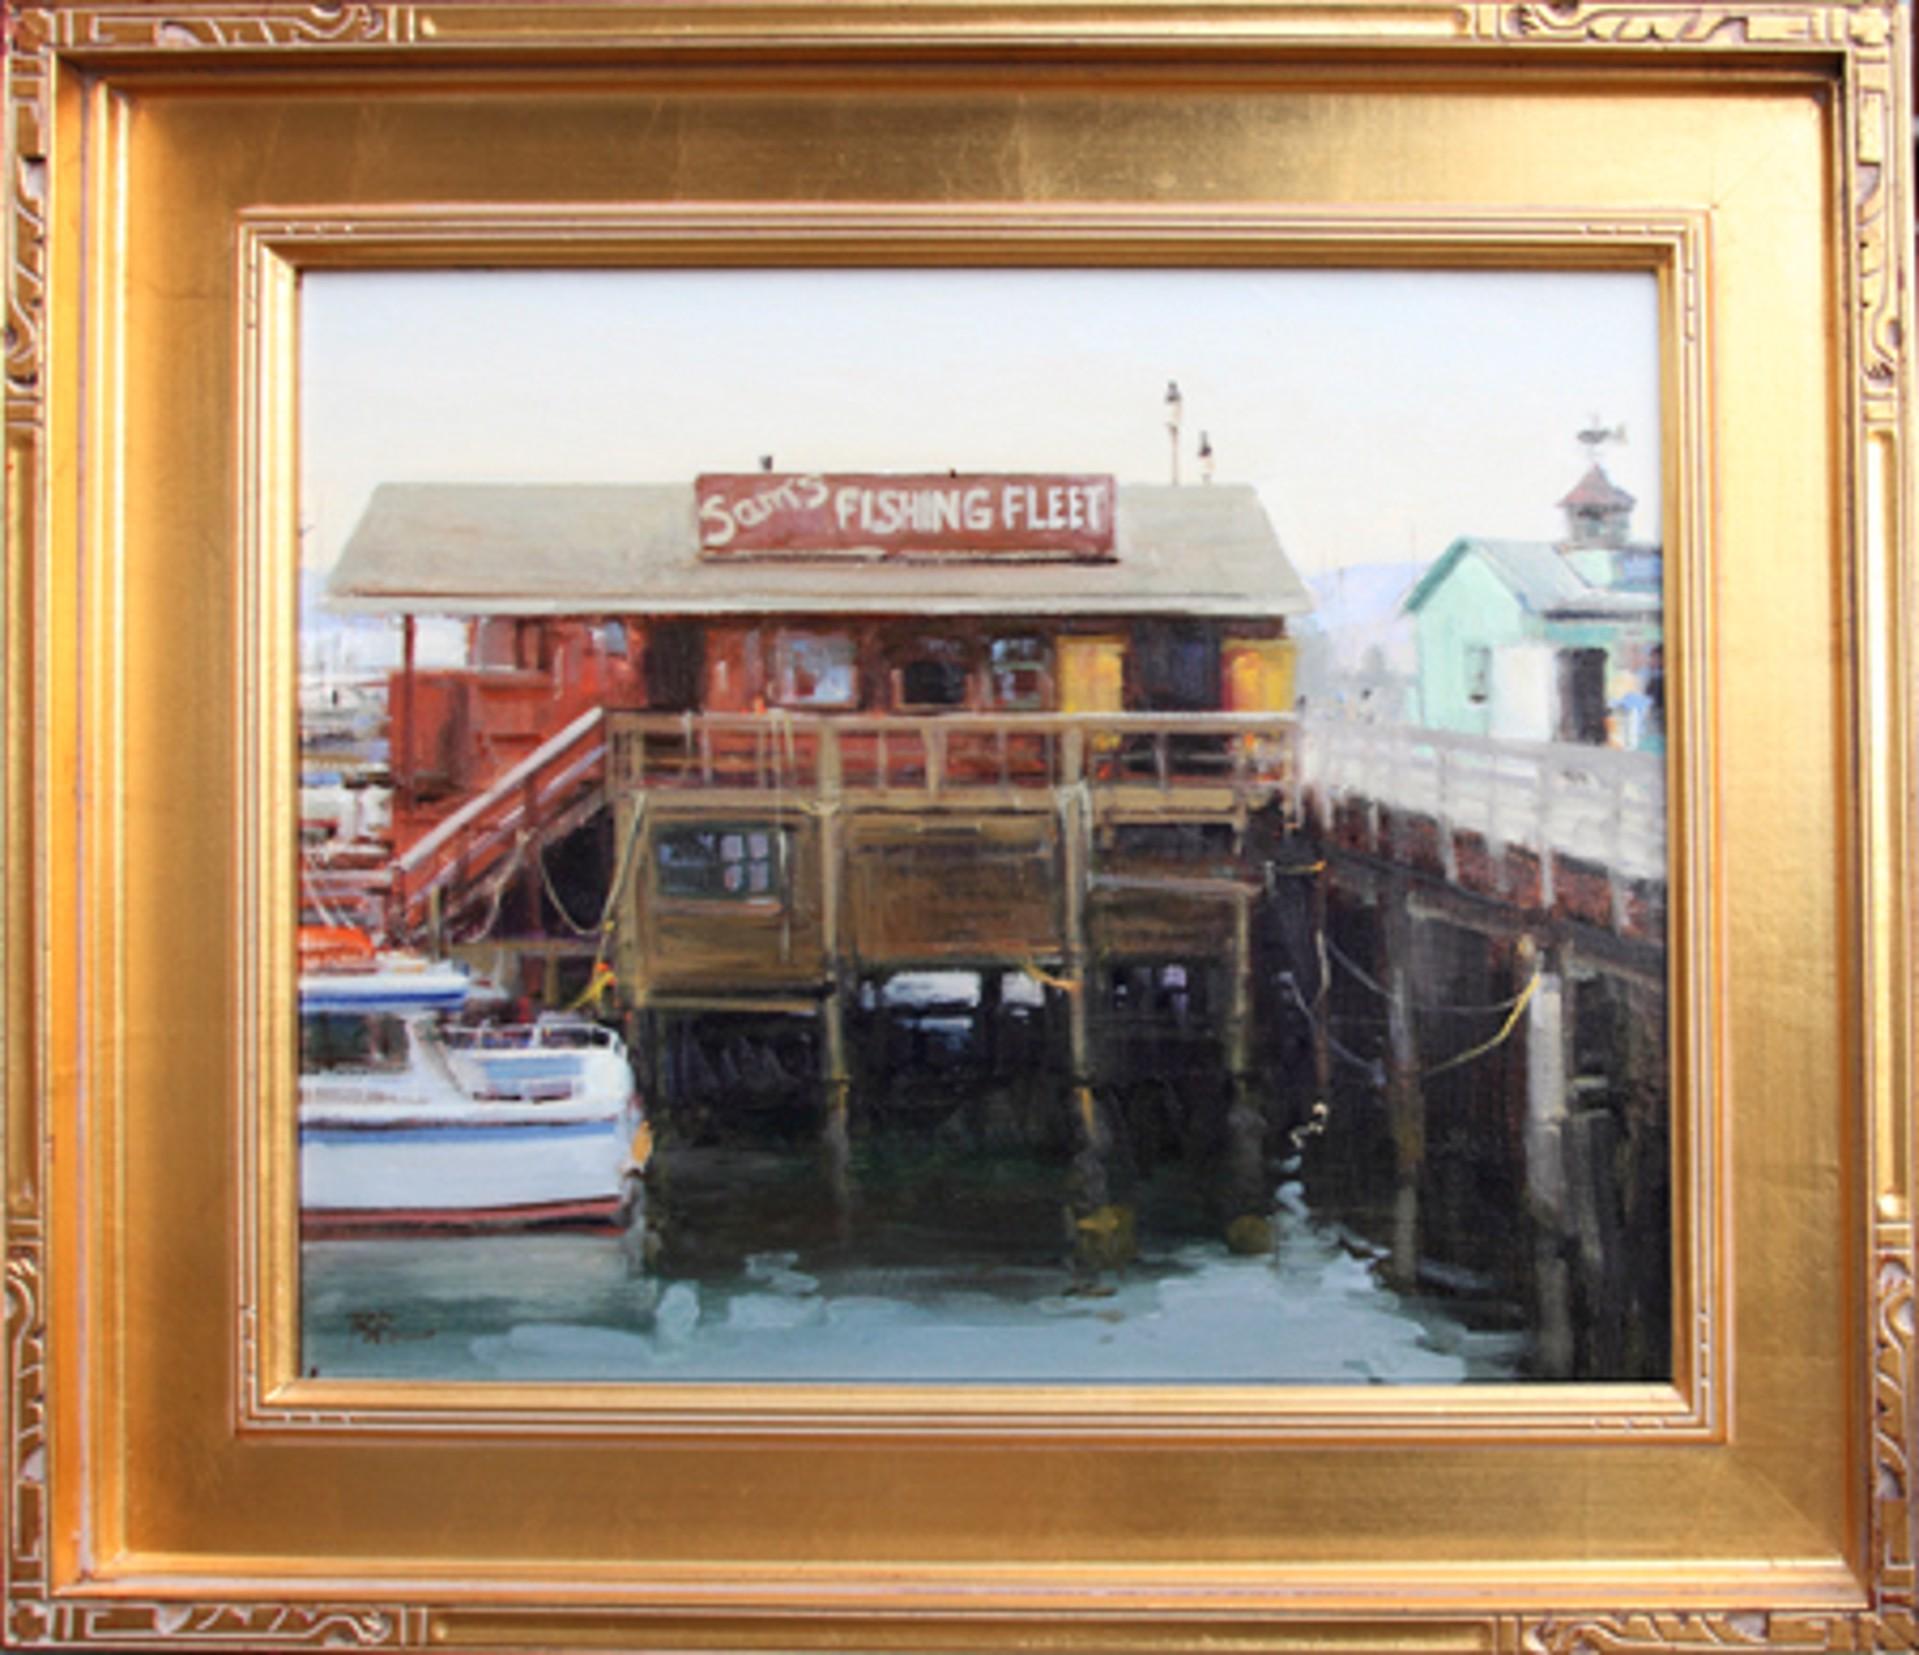 Sam's Fishing Fleet by Brian Blood